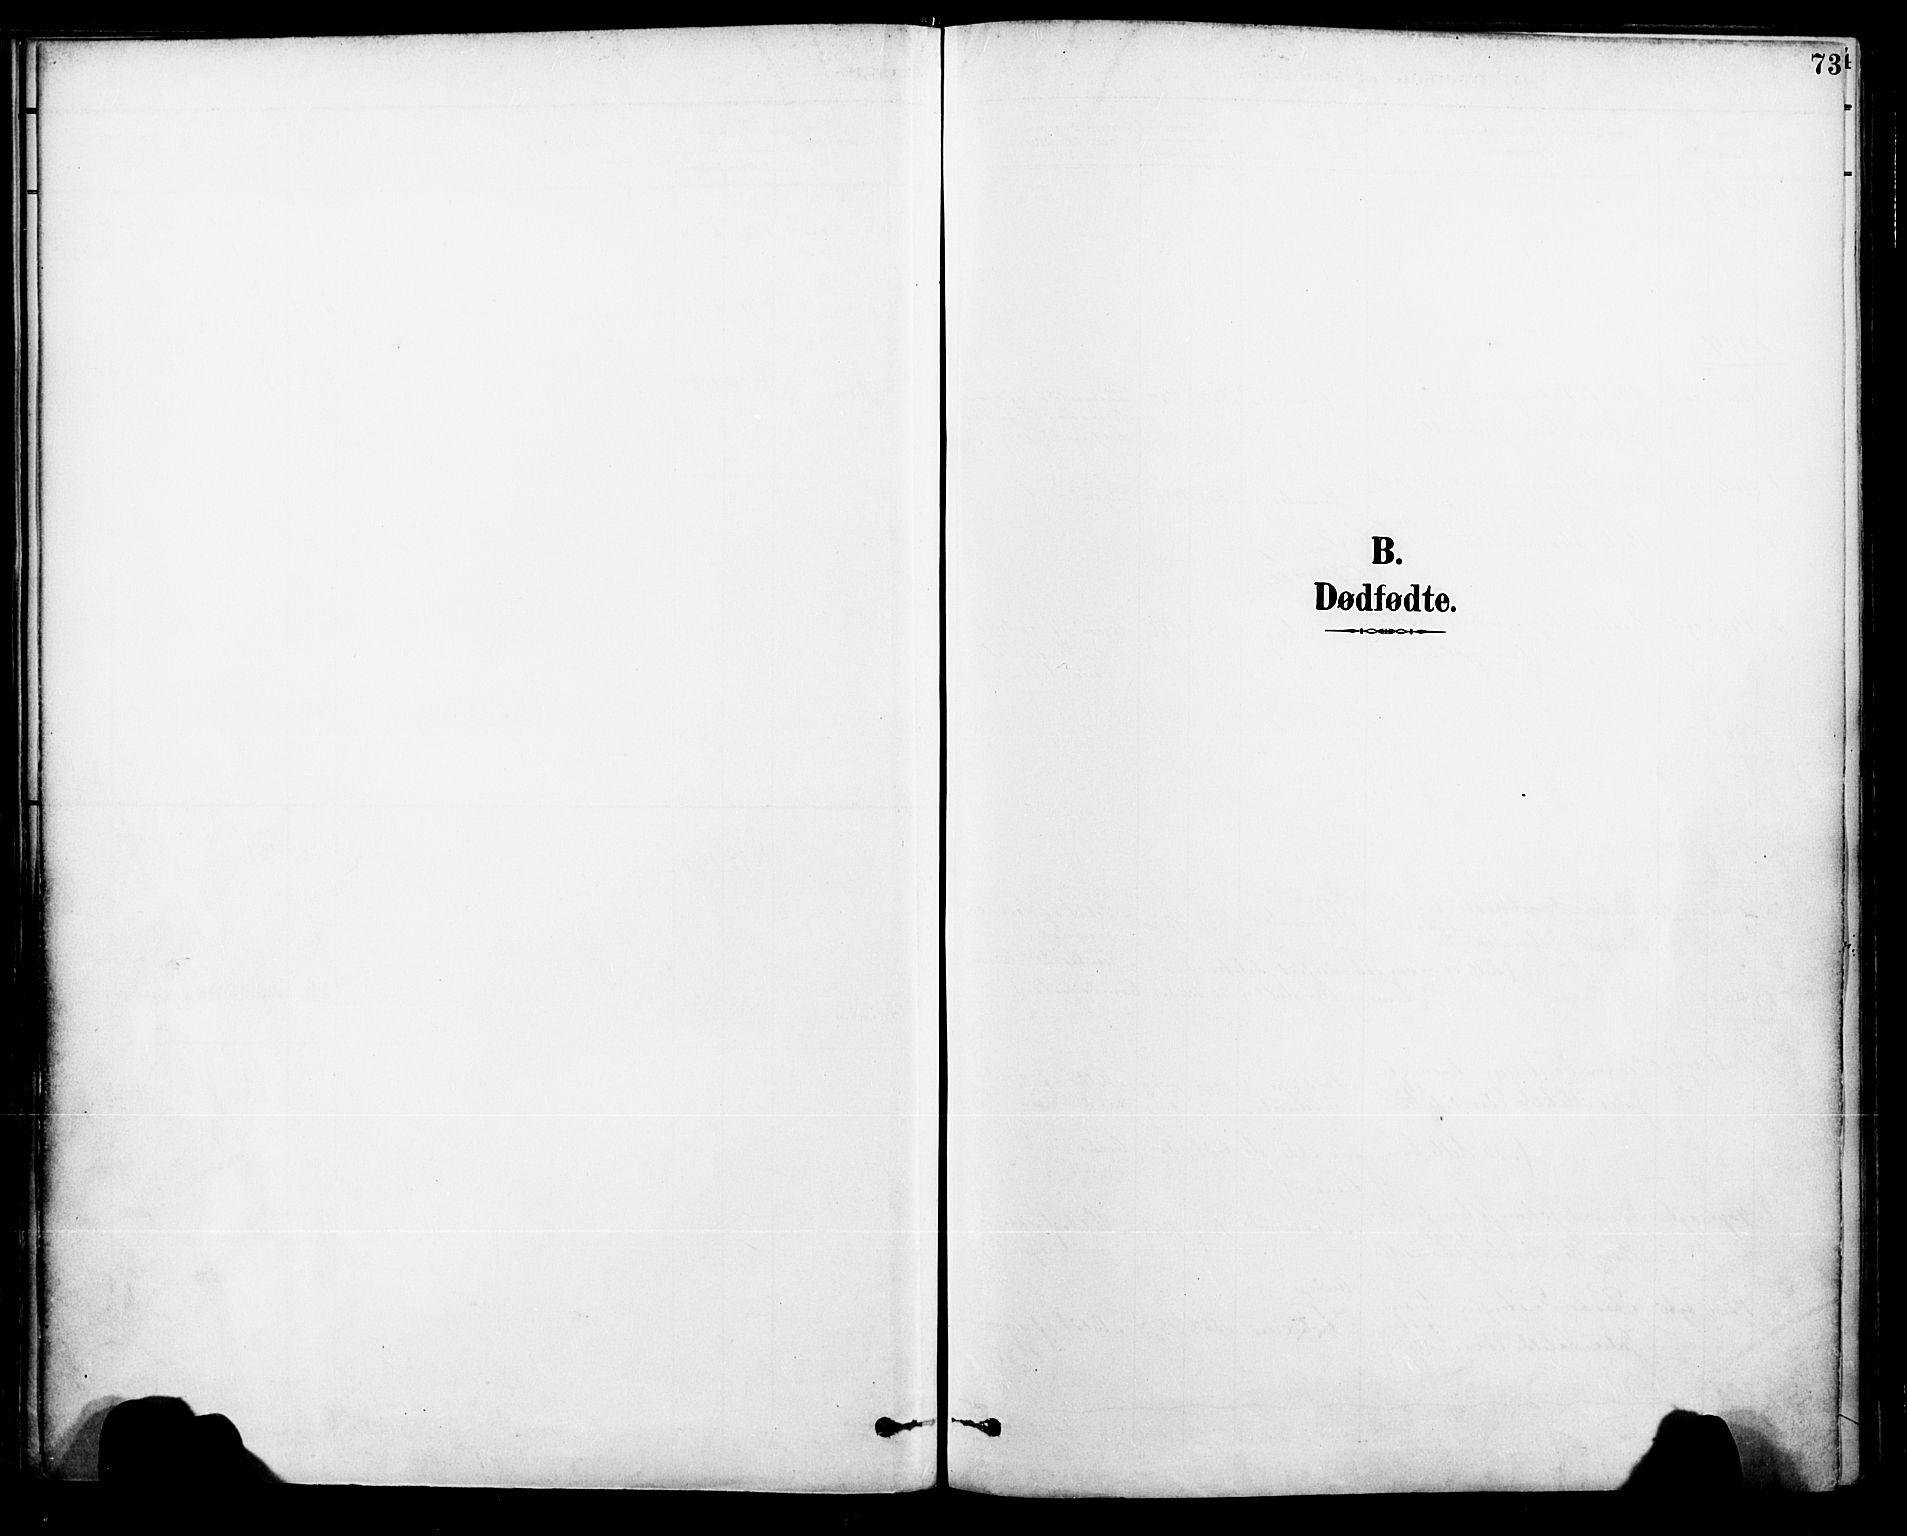 SAT, Ministerialprotokoller, klokkerbøker og fødselsregistre - Nordland, 885/L1205: Ministerialbok nr. 885A06, 1892-1905, s. 73